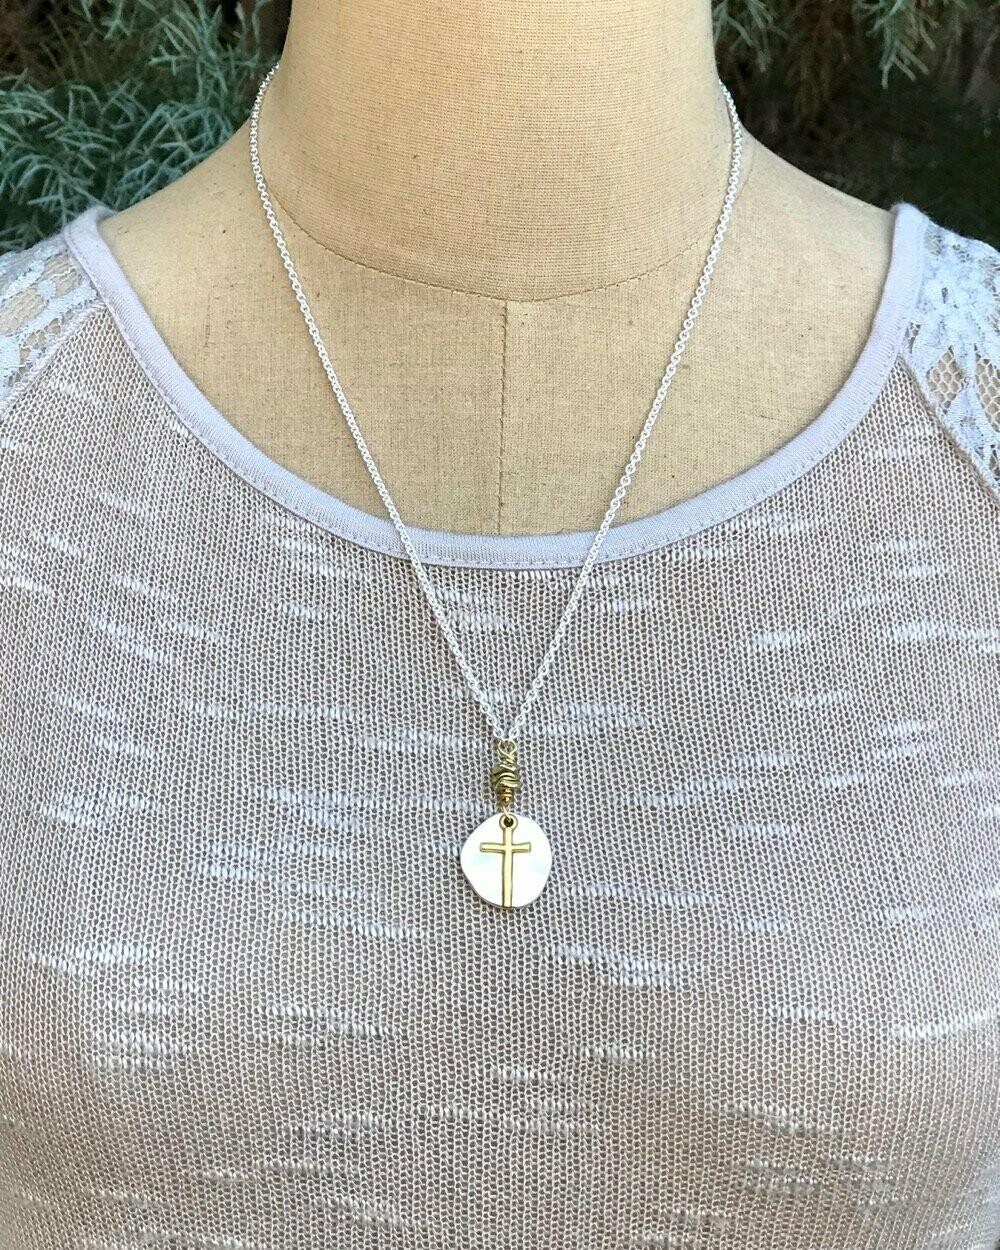 Treasure Chest Cross Necklace